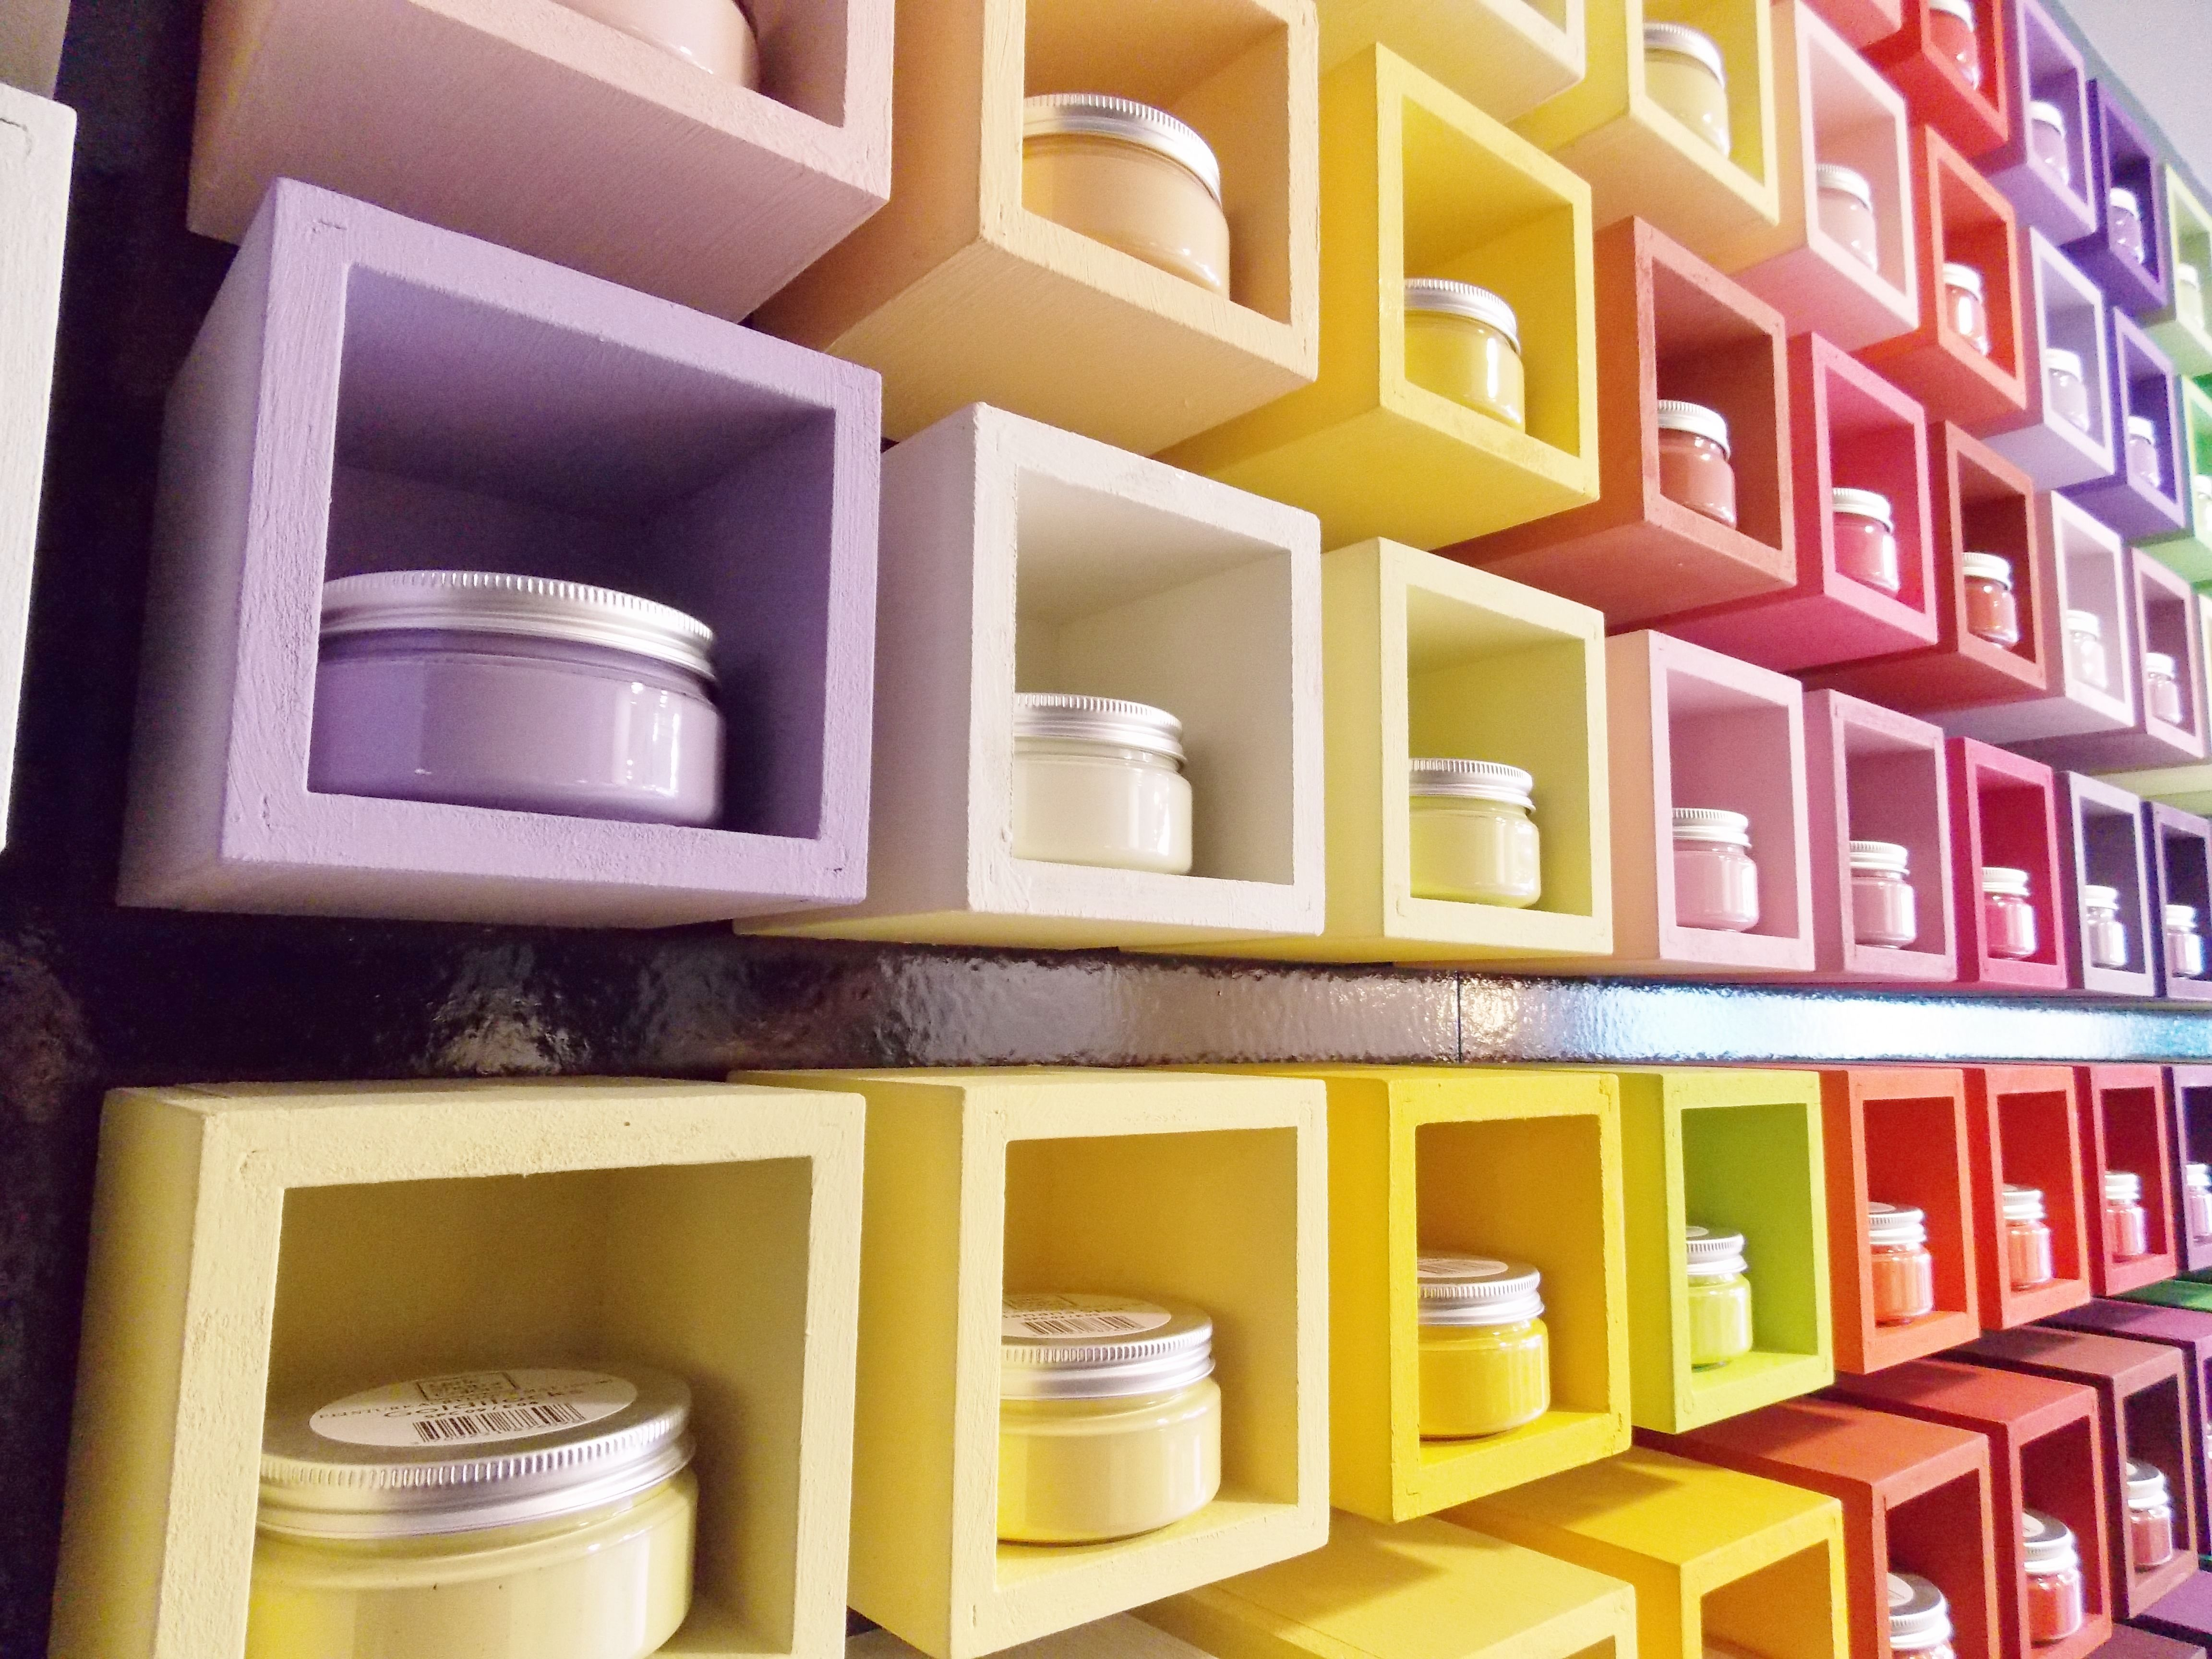 Le Showroom Deco Blue Corner A Caen Showroom Decoration Interieure Deco